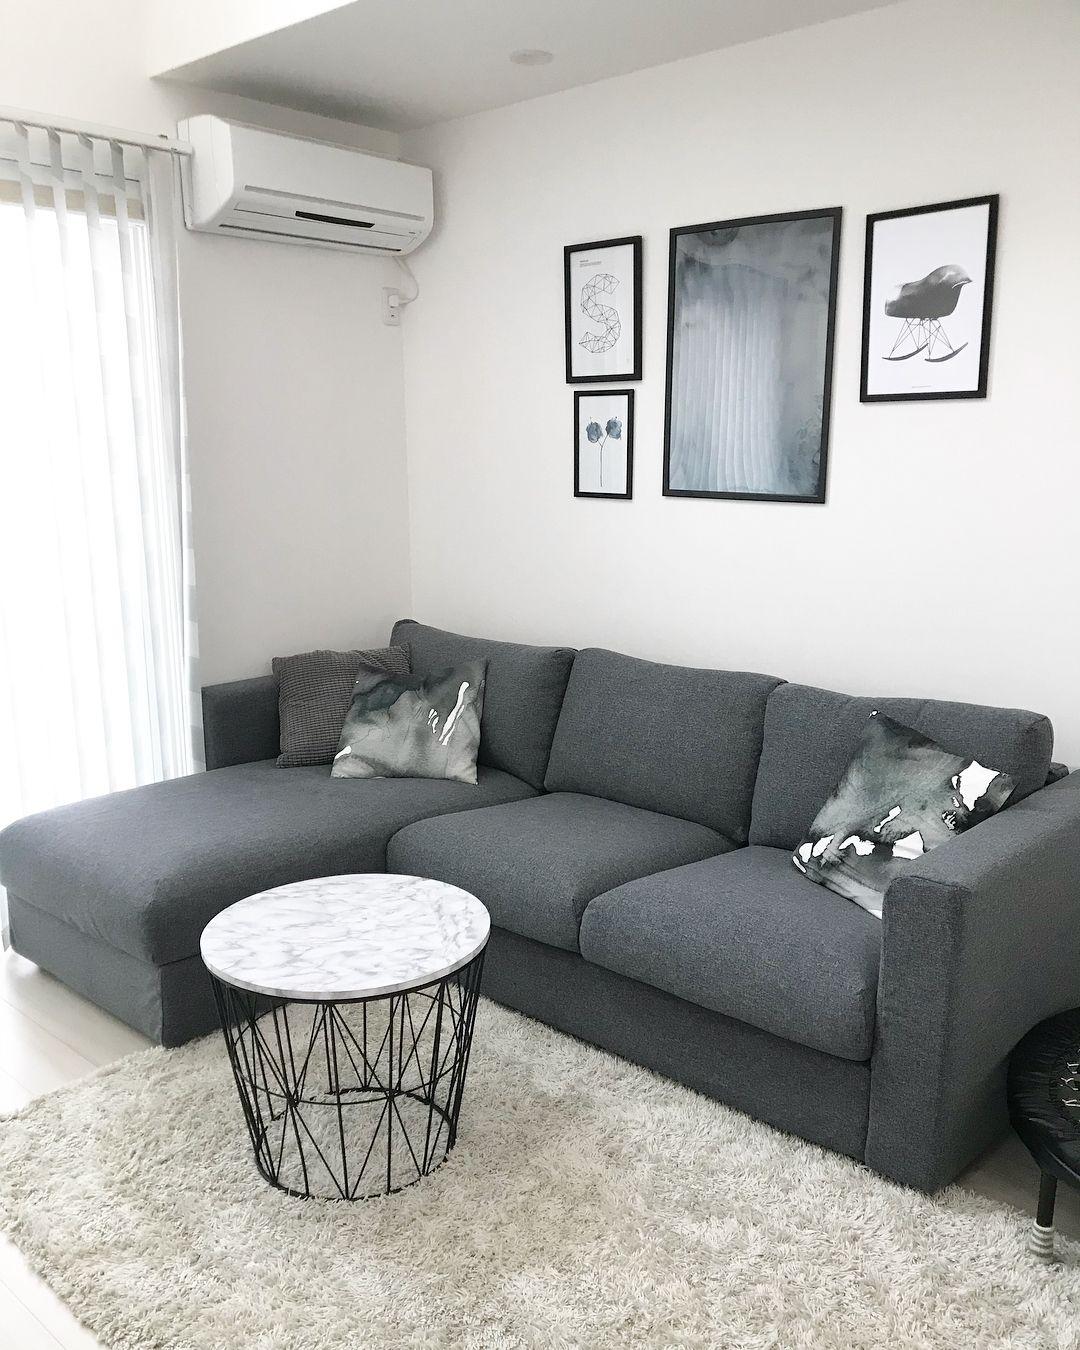 IKEA Vimle Sofa in Grey design layout is lovely!!  Ikea vimle